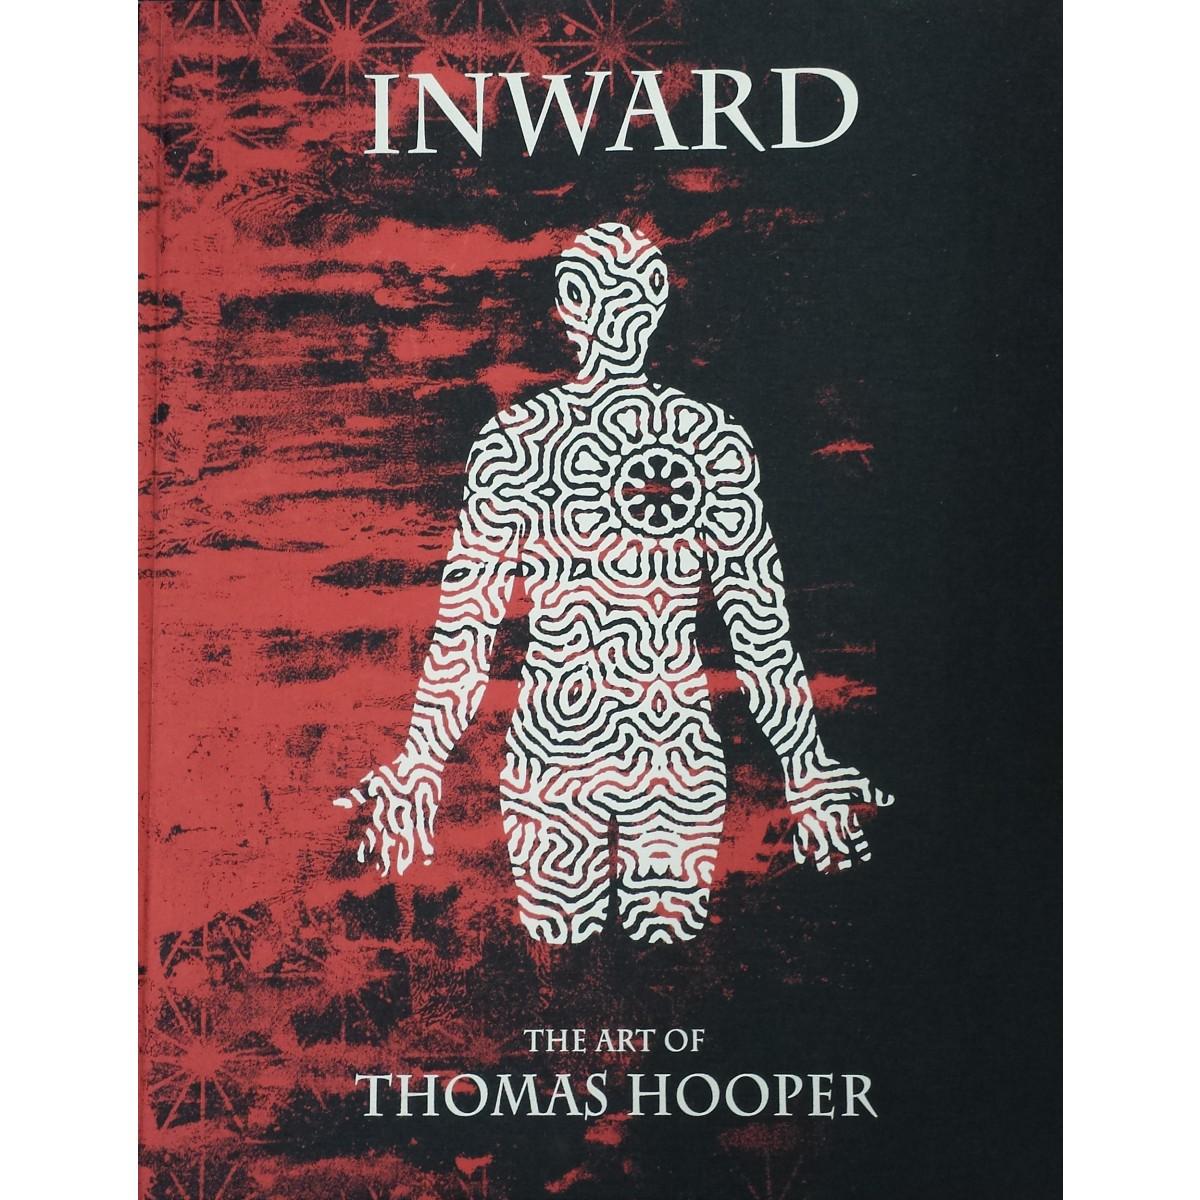 inward_the_art_of_thomas_hooper.jpg